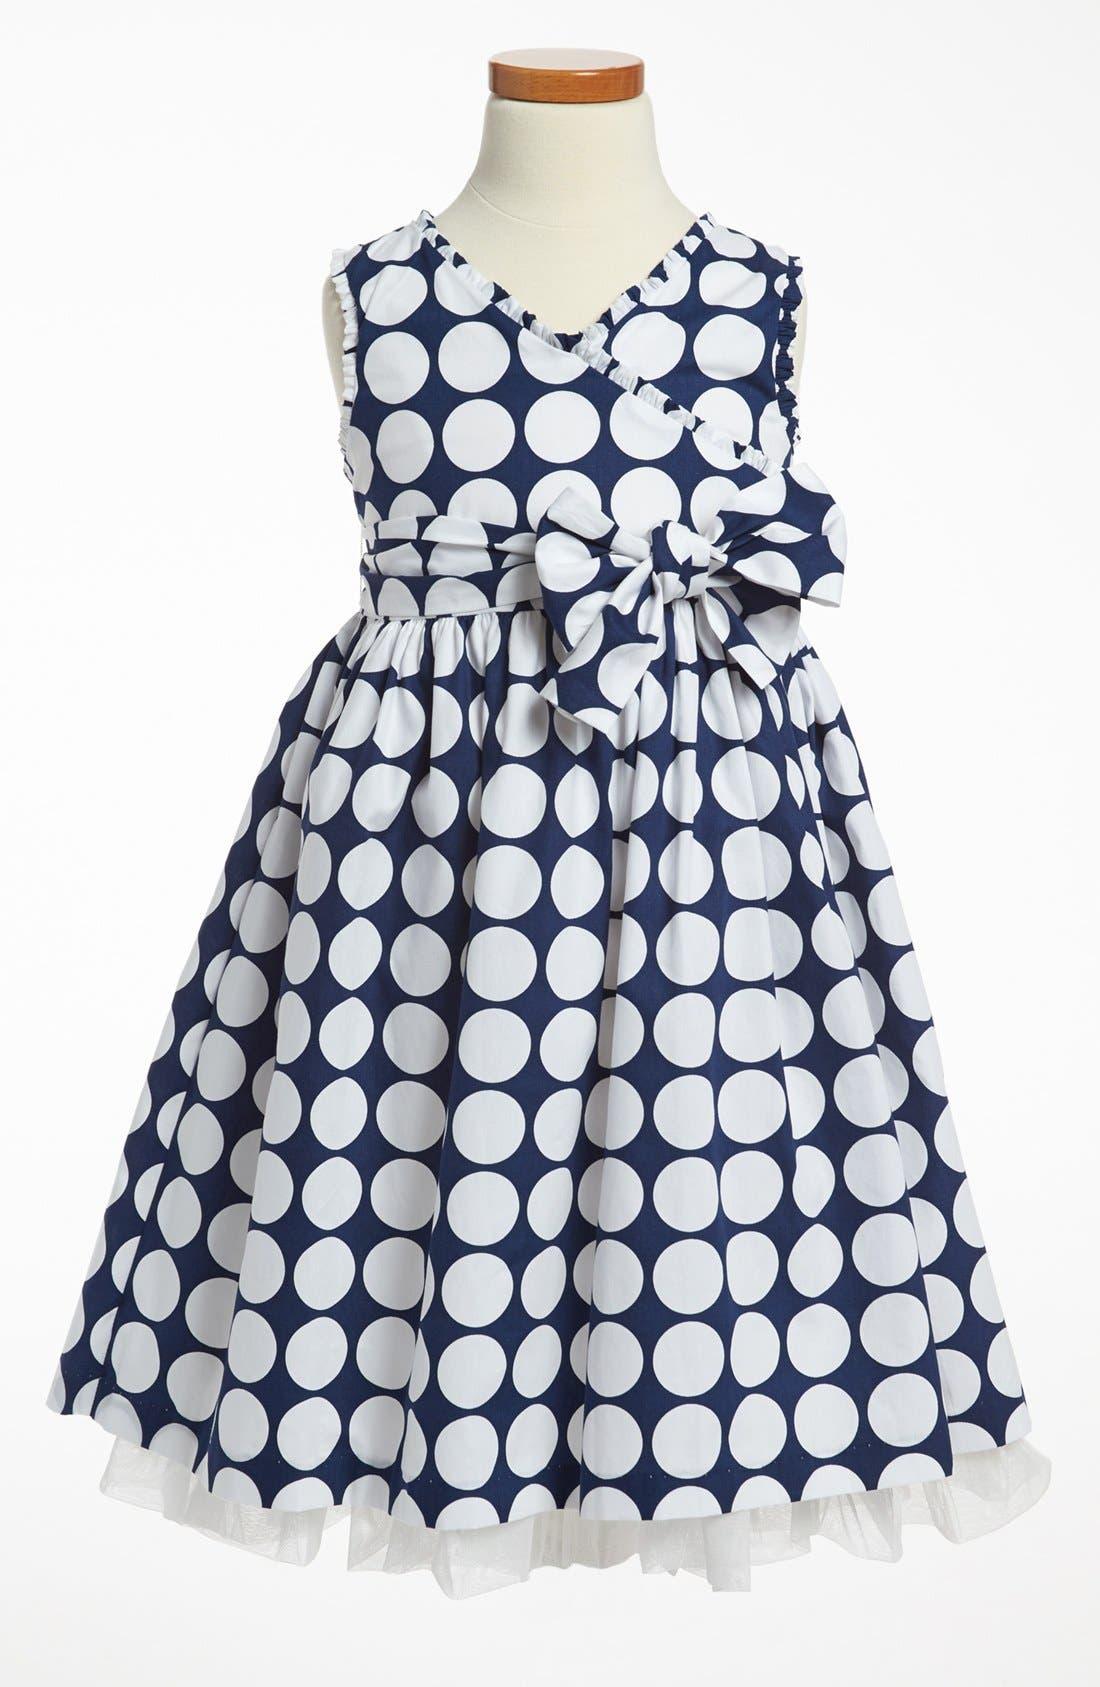 Alternate Image 1 Selected - Pippa & Julie Print Dress (Toddler Girls, Little Girls & Big Girls)